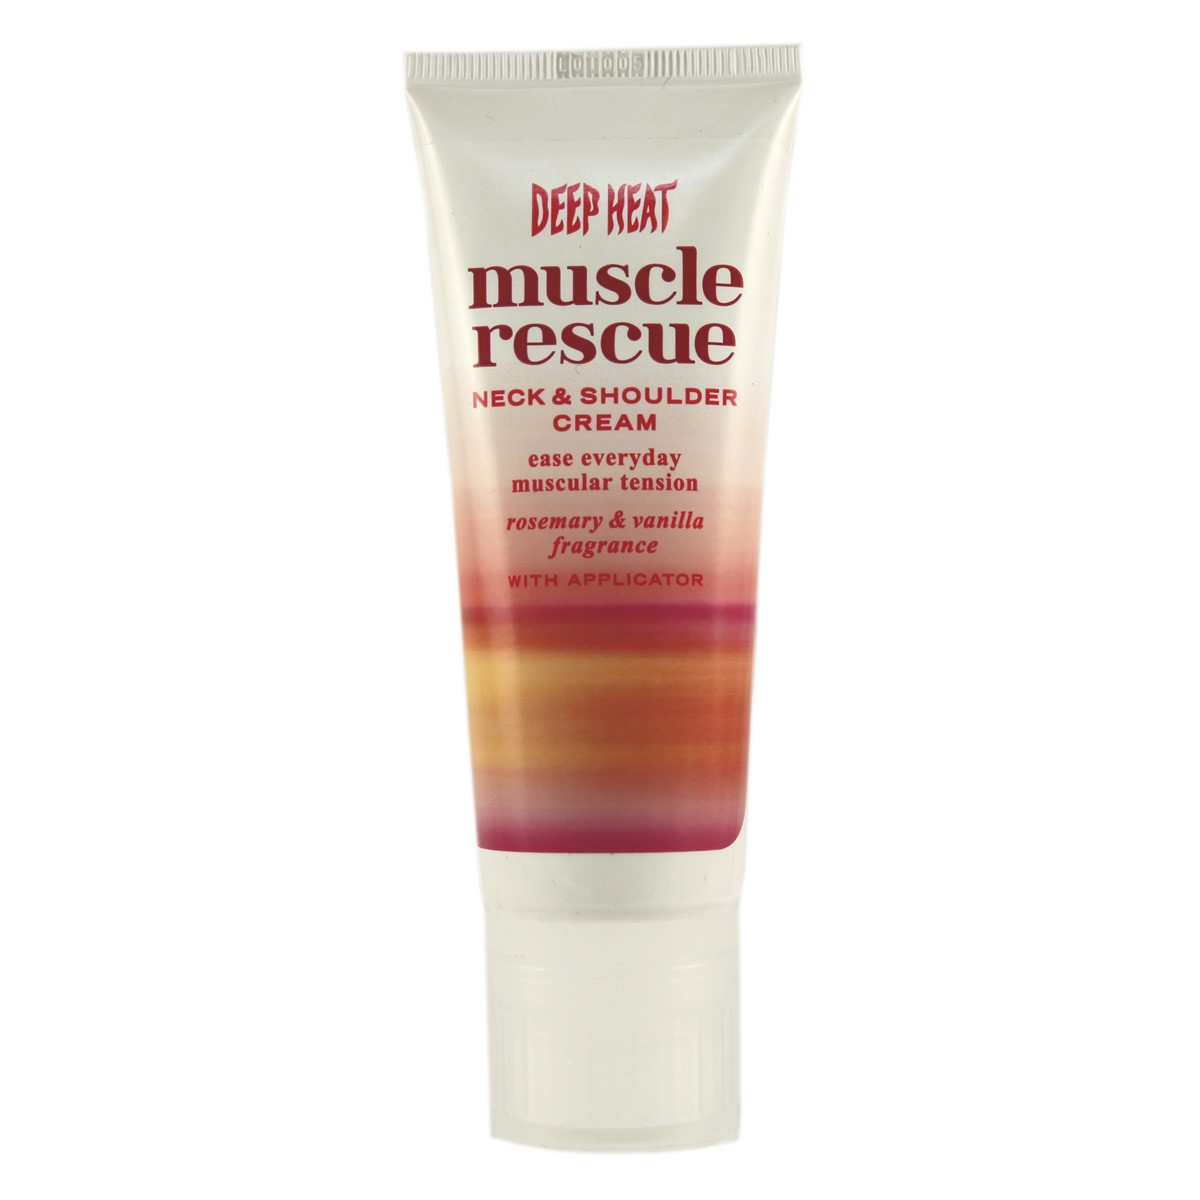 Deep Heat Muscle Rescue Neck & Shoulder Cream